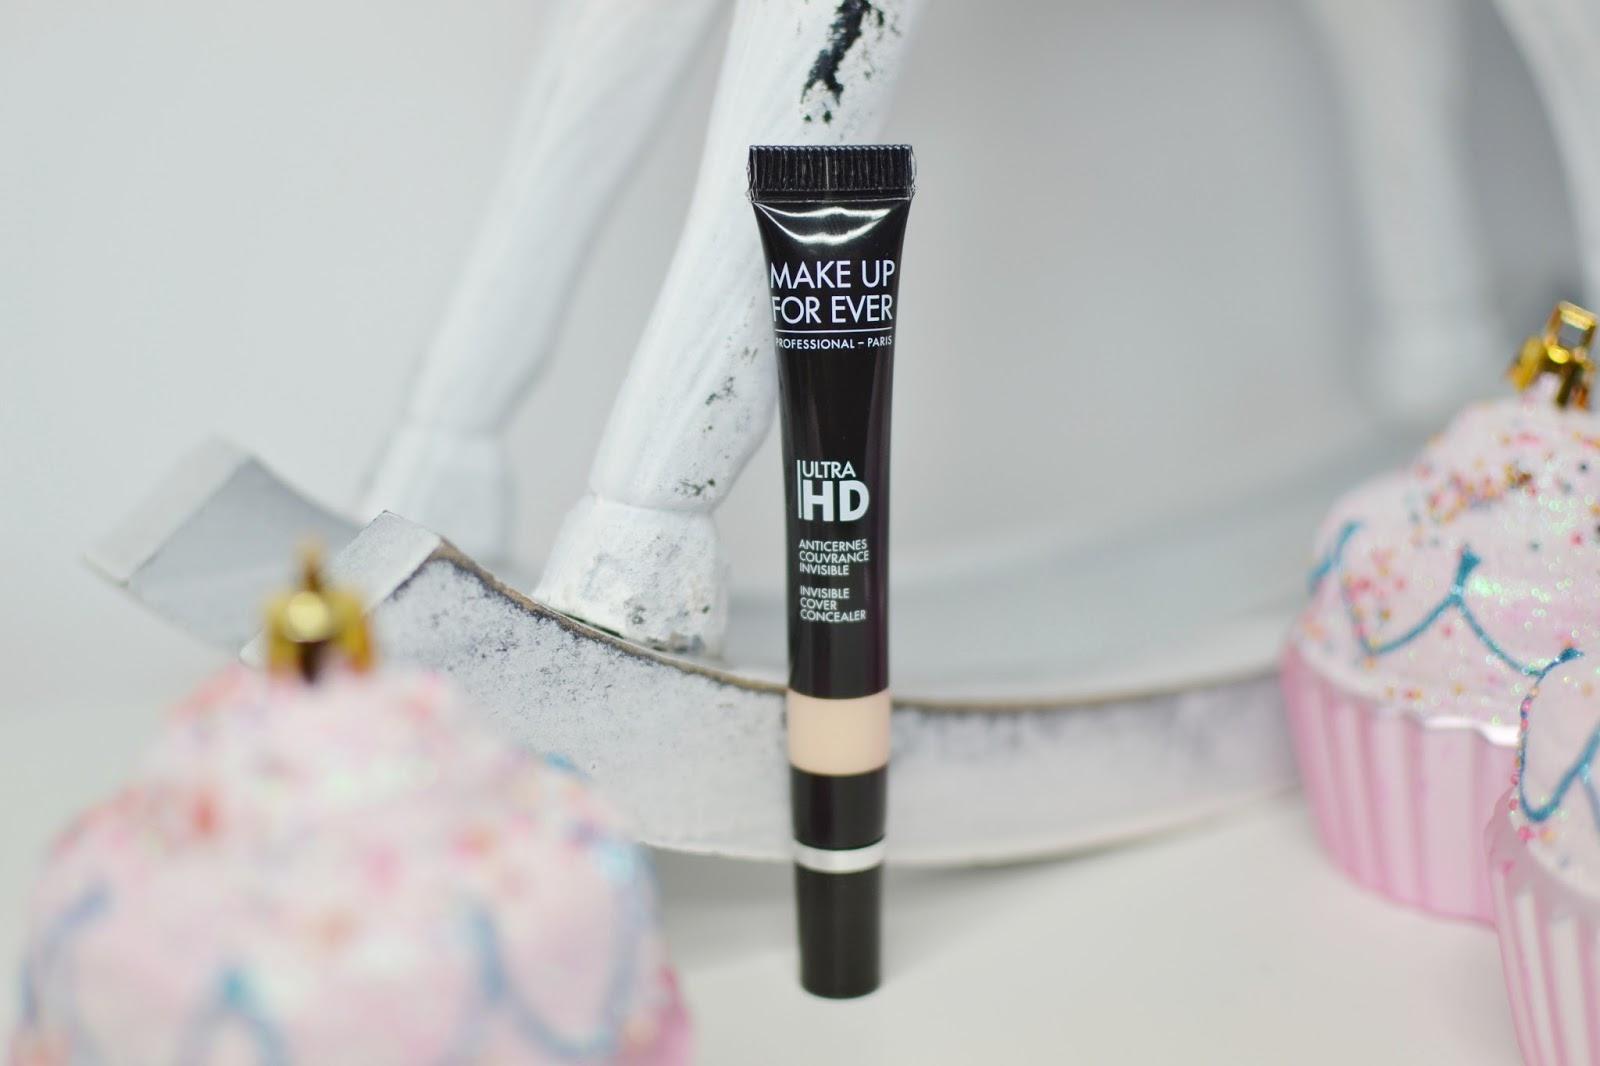 make up for ever korektor ultra hd